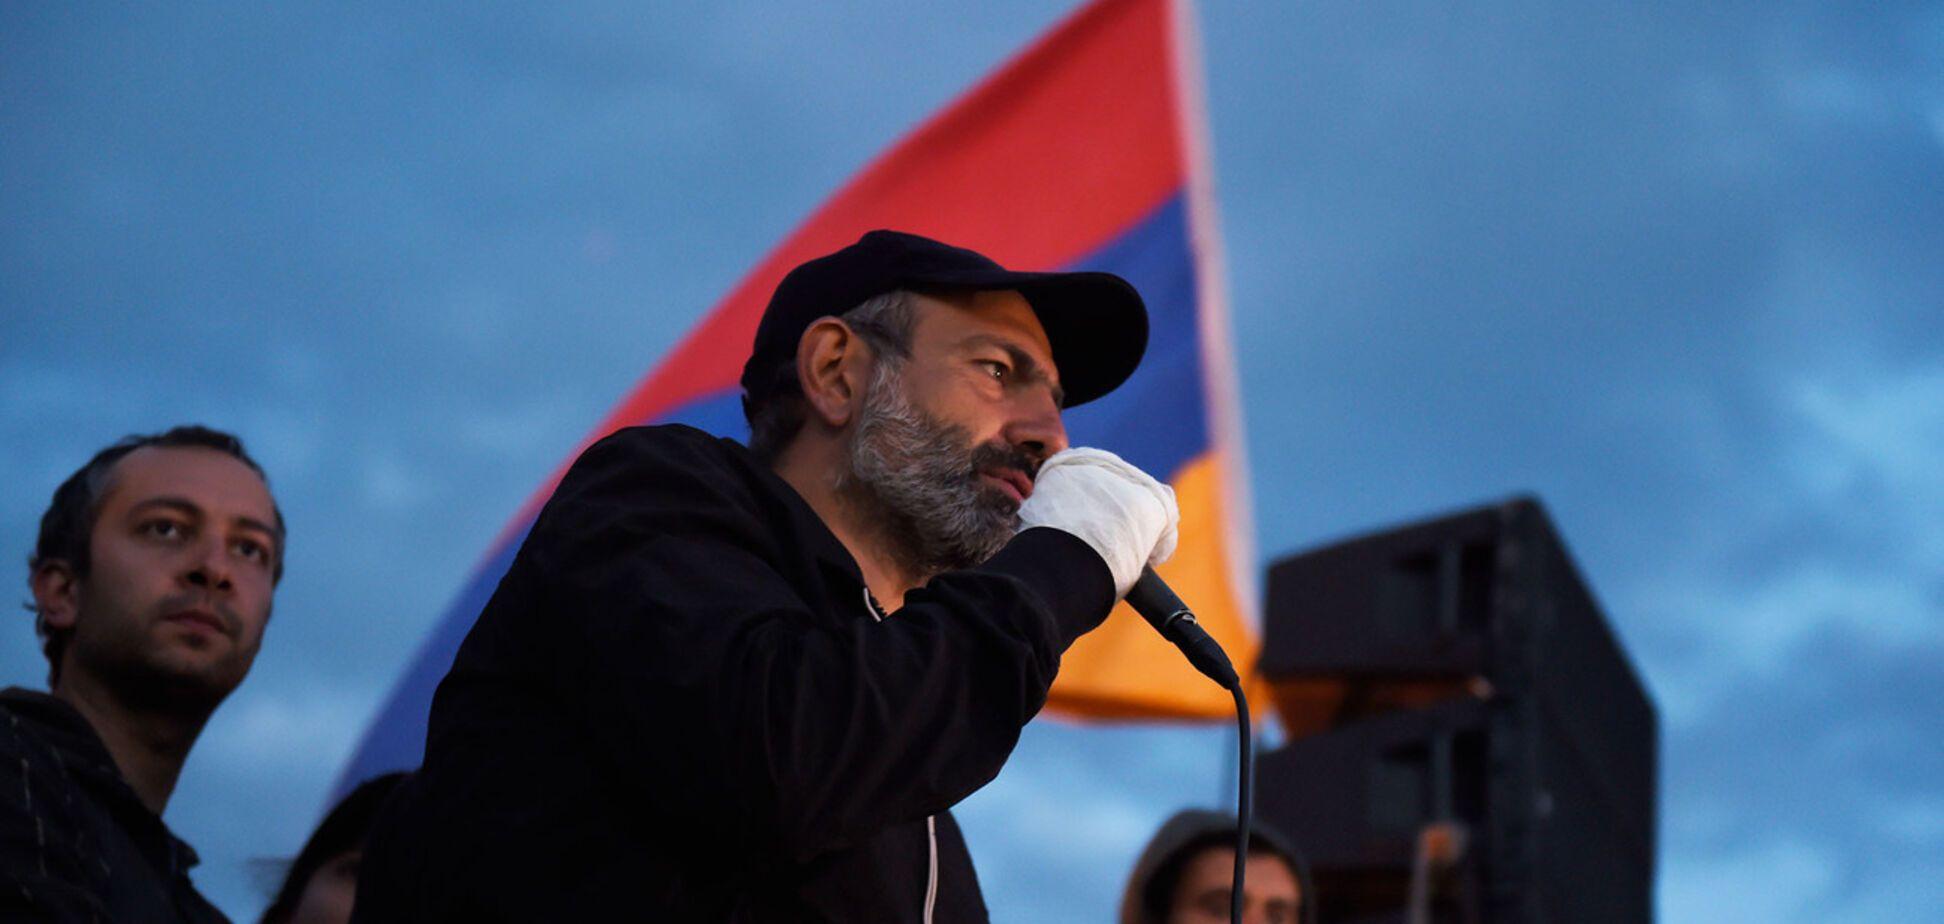 'Чуда не произошло': в сети обсудили неудачу лидера протестов в Армении